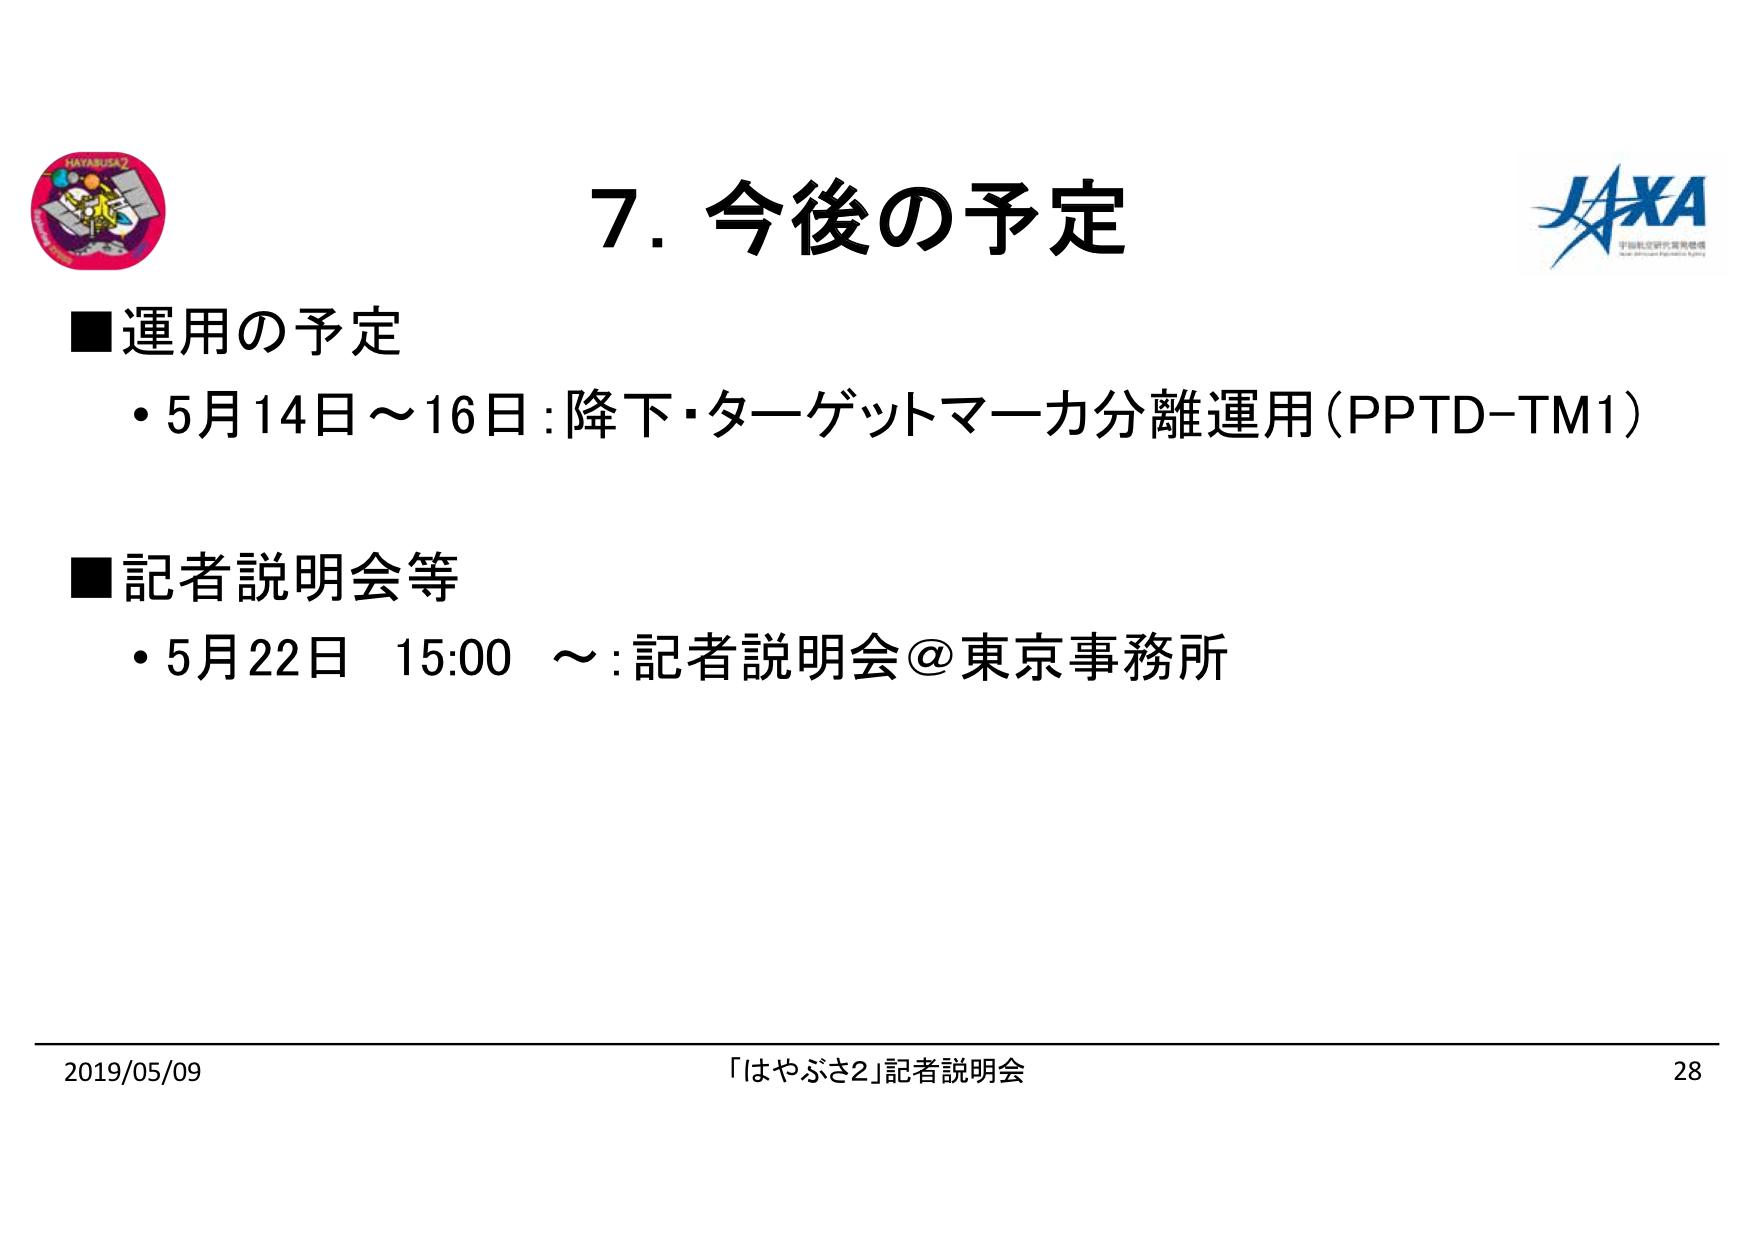 f:id:Imamura:20190509154424p:plain